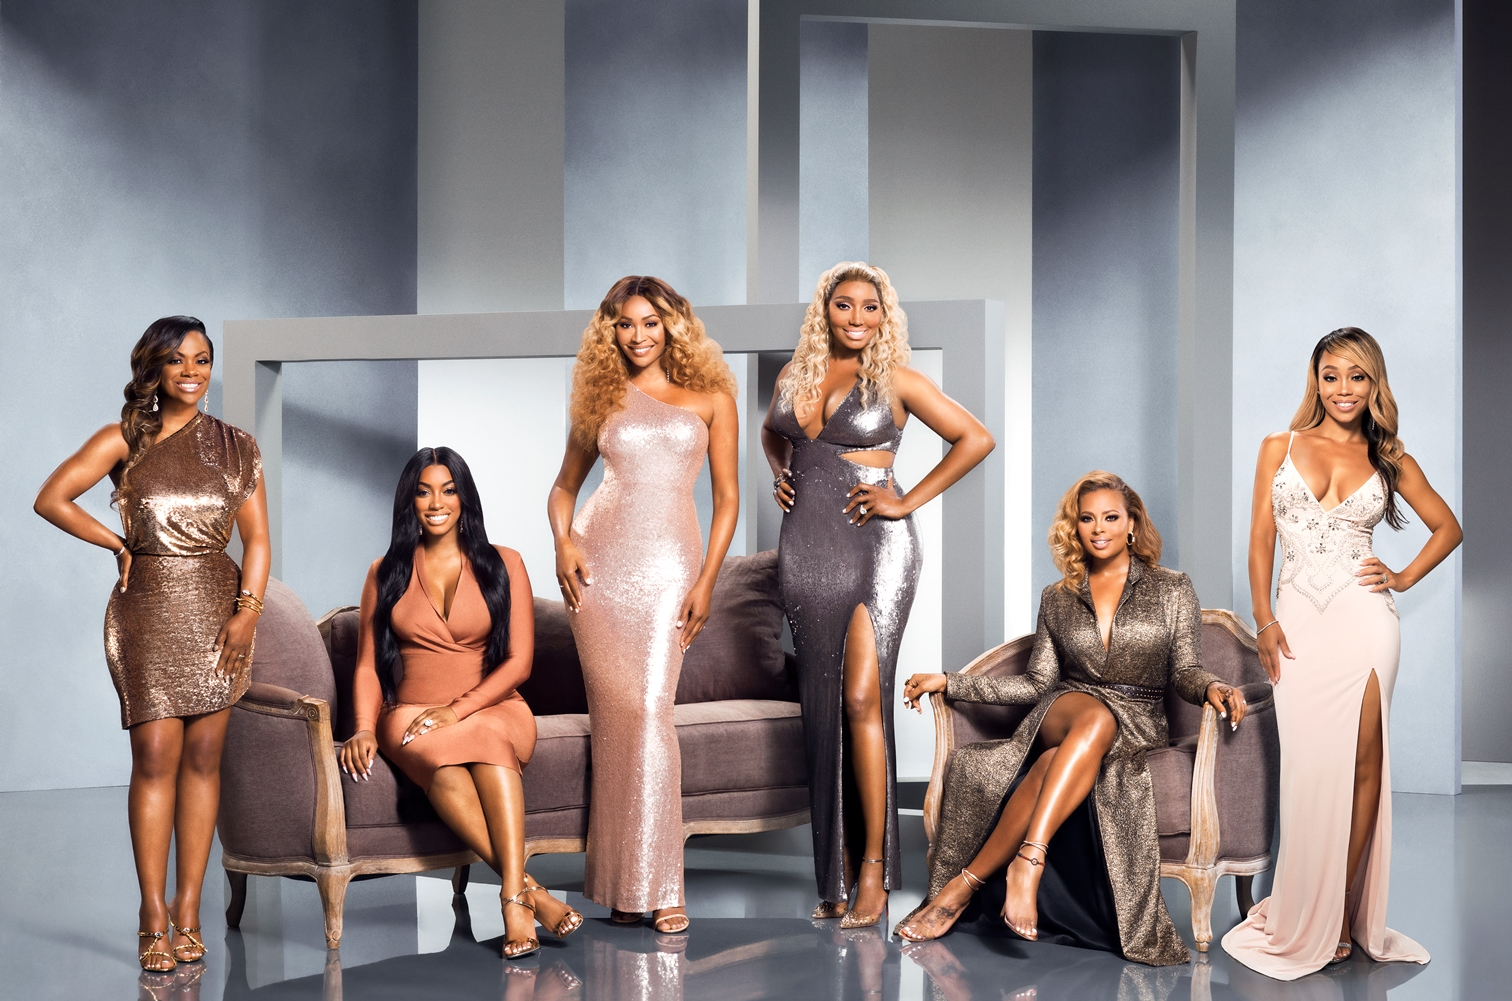 The-Real-Housewives-of-Atlanta-Season-11-Cast-Photo.jpg